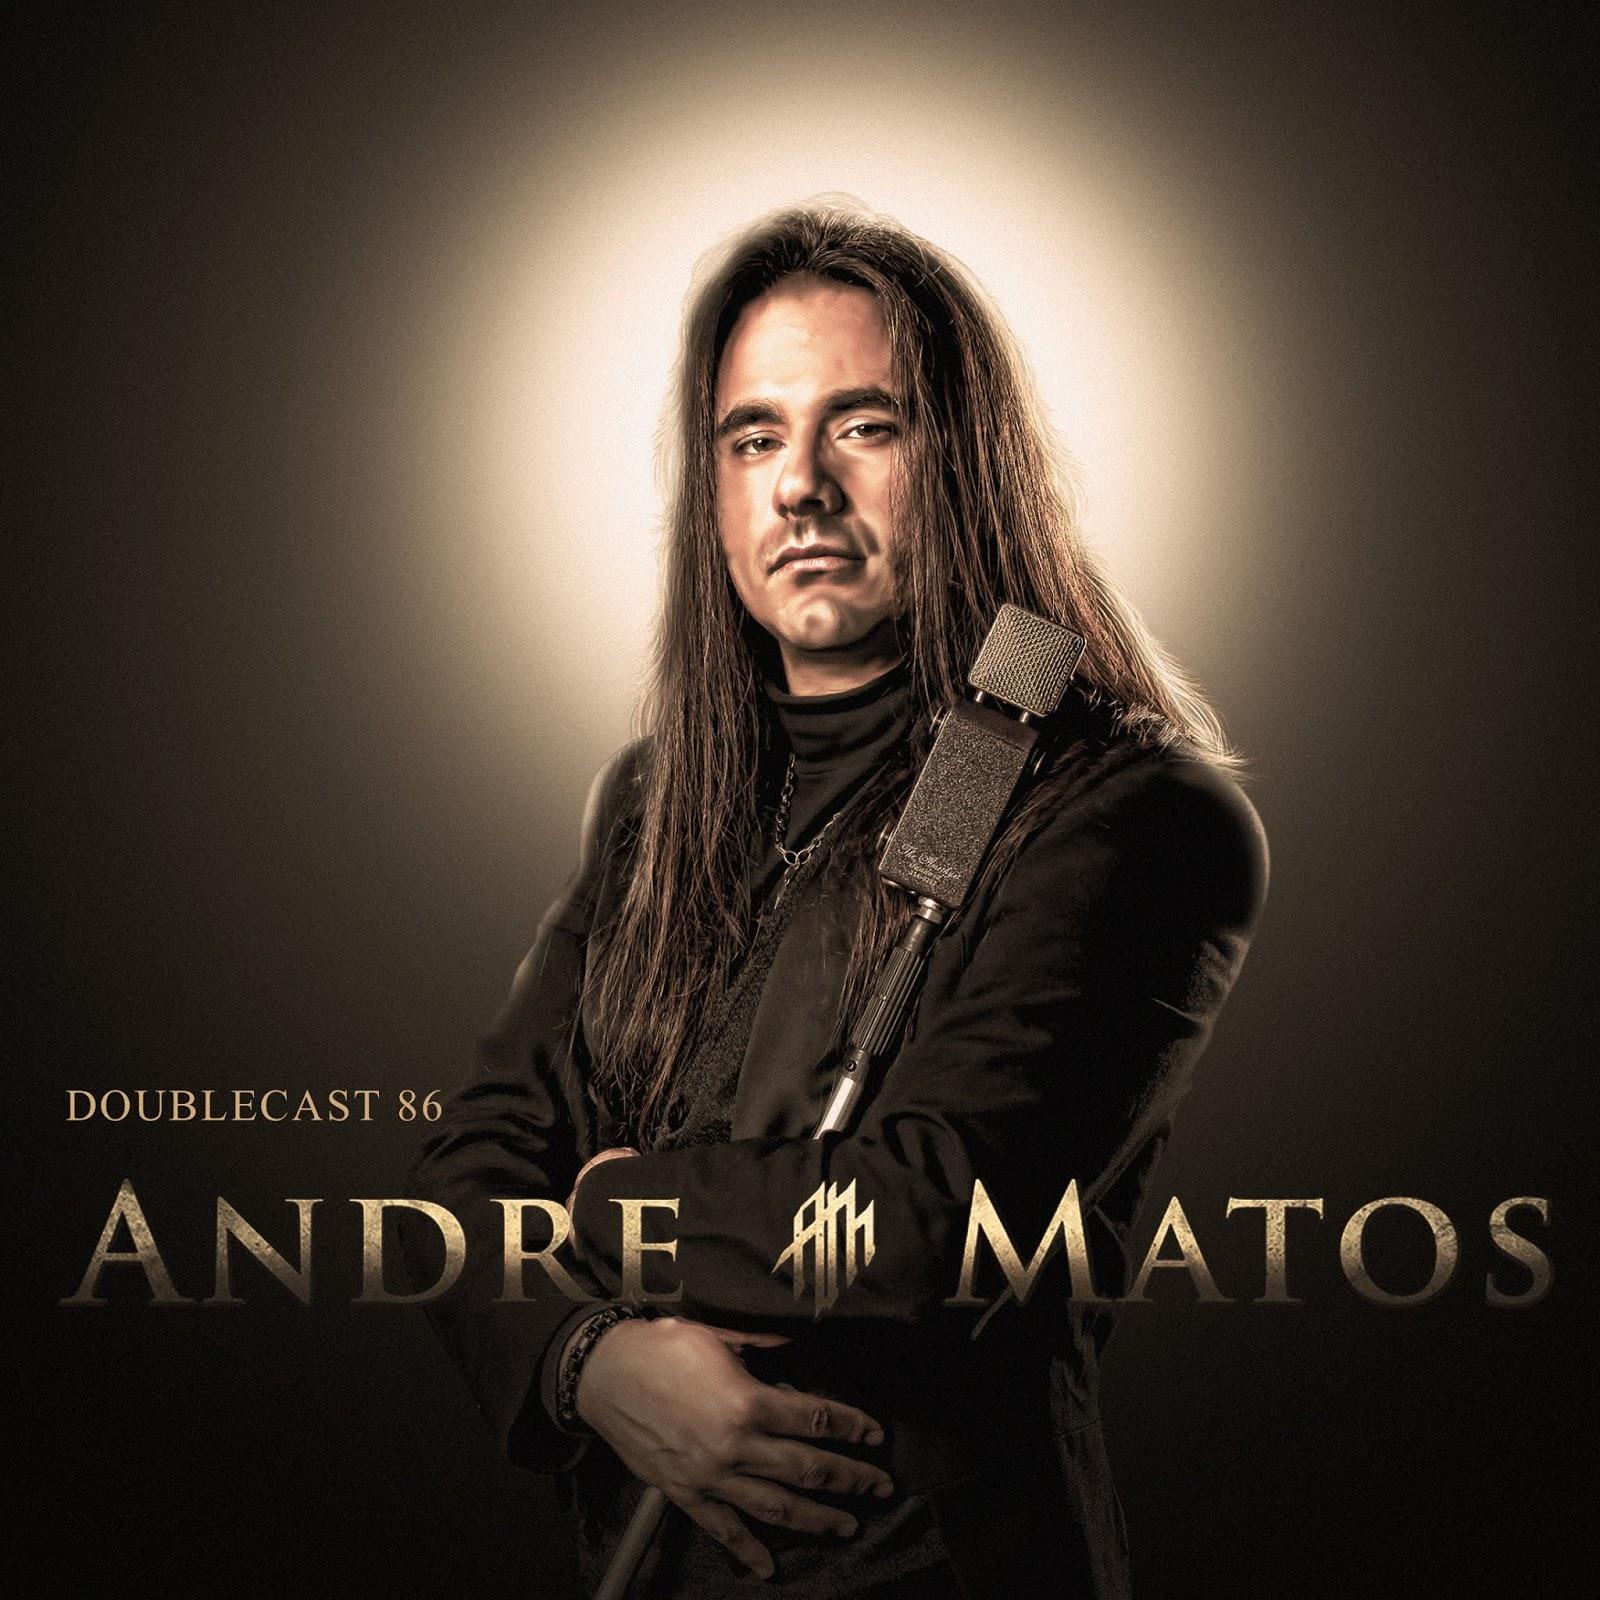 Doublecast 86 - Andre Matos